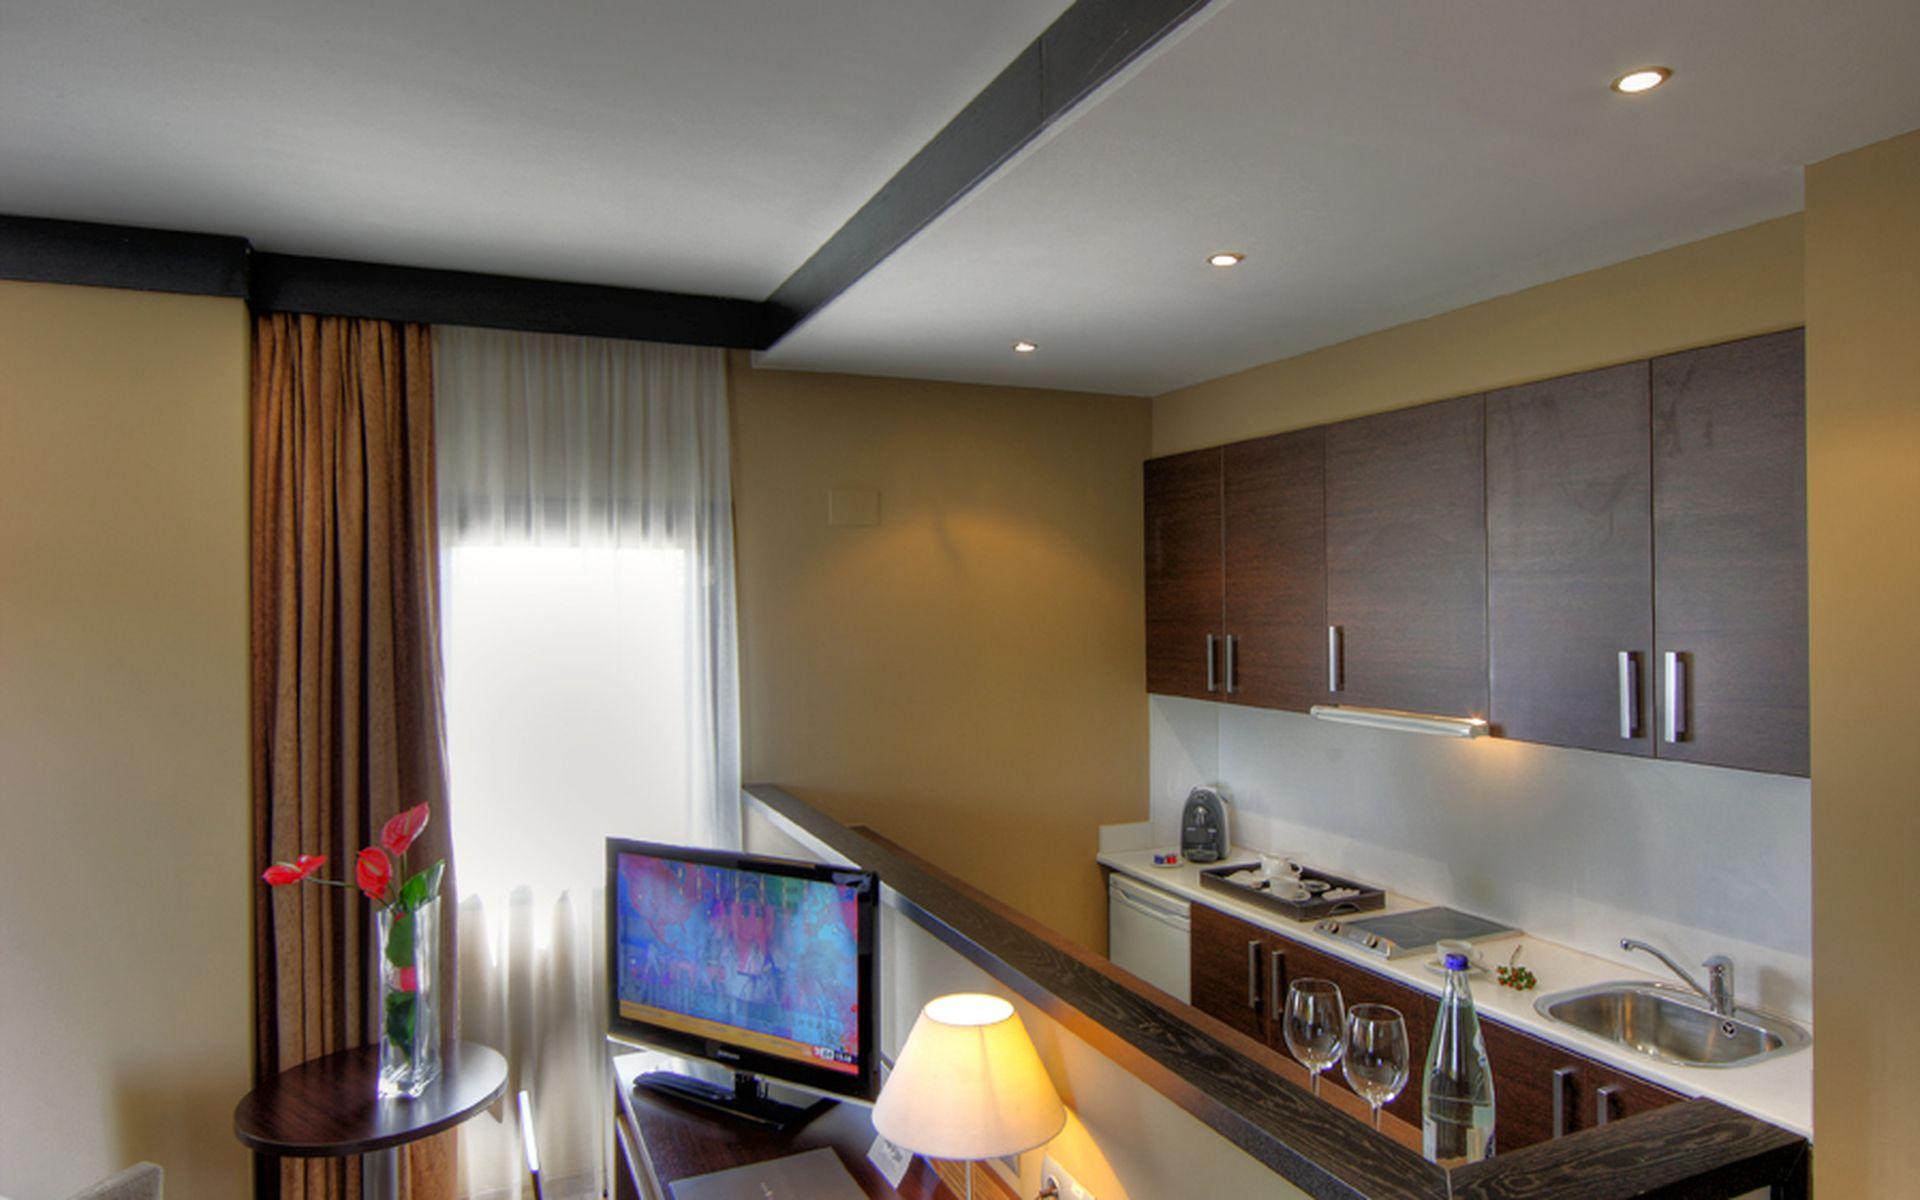 Aparthotel attica 21 vall s sabadell logitravel - Television pequena plana ...